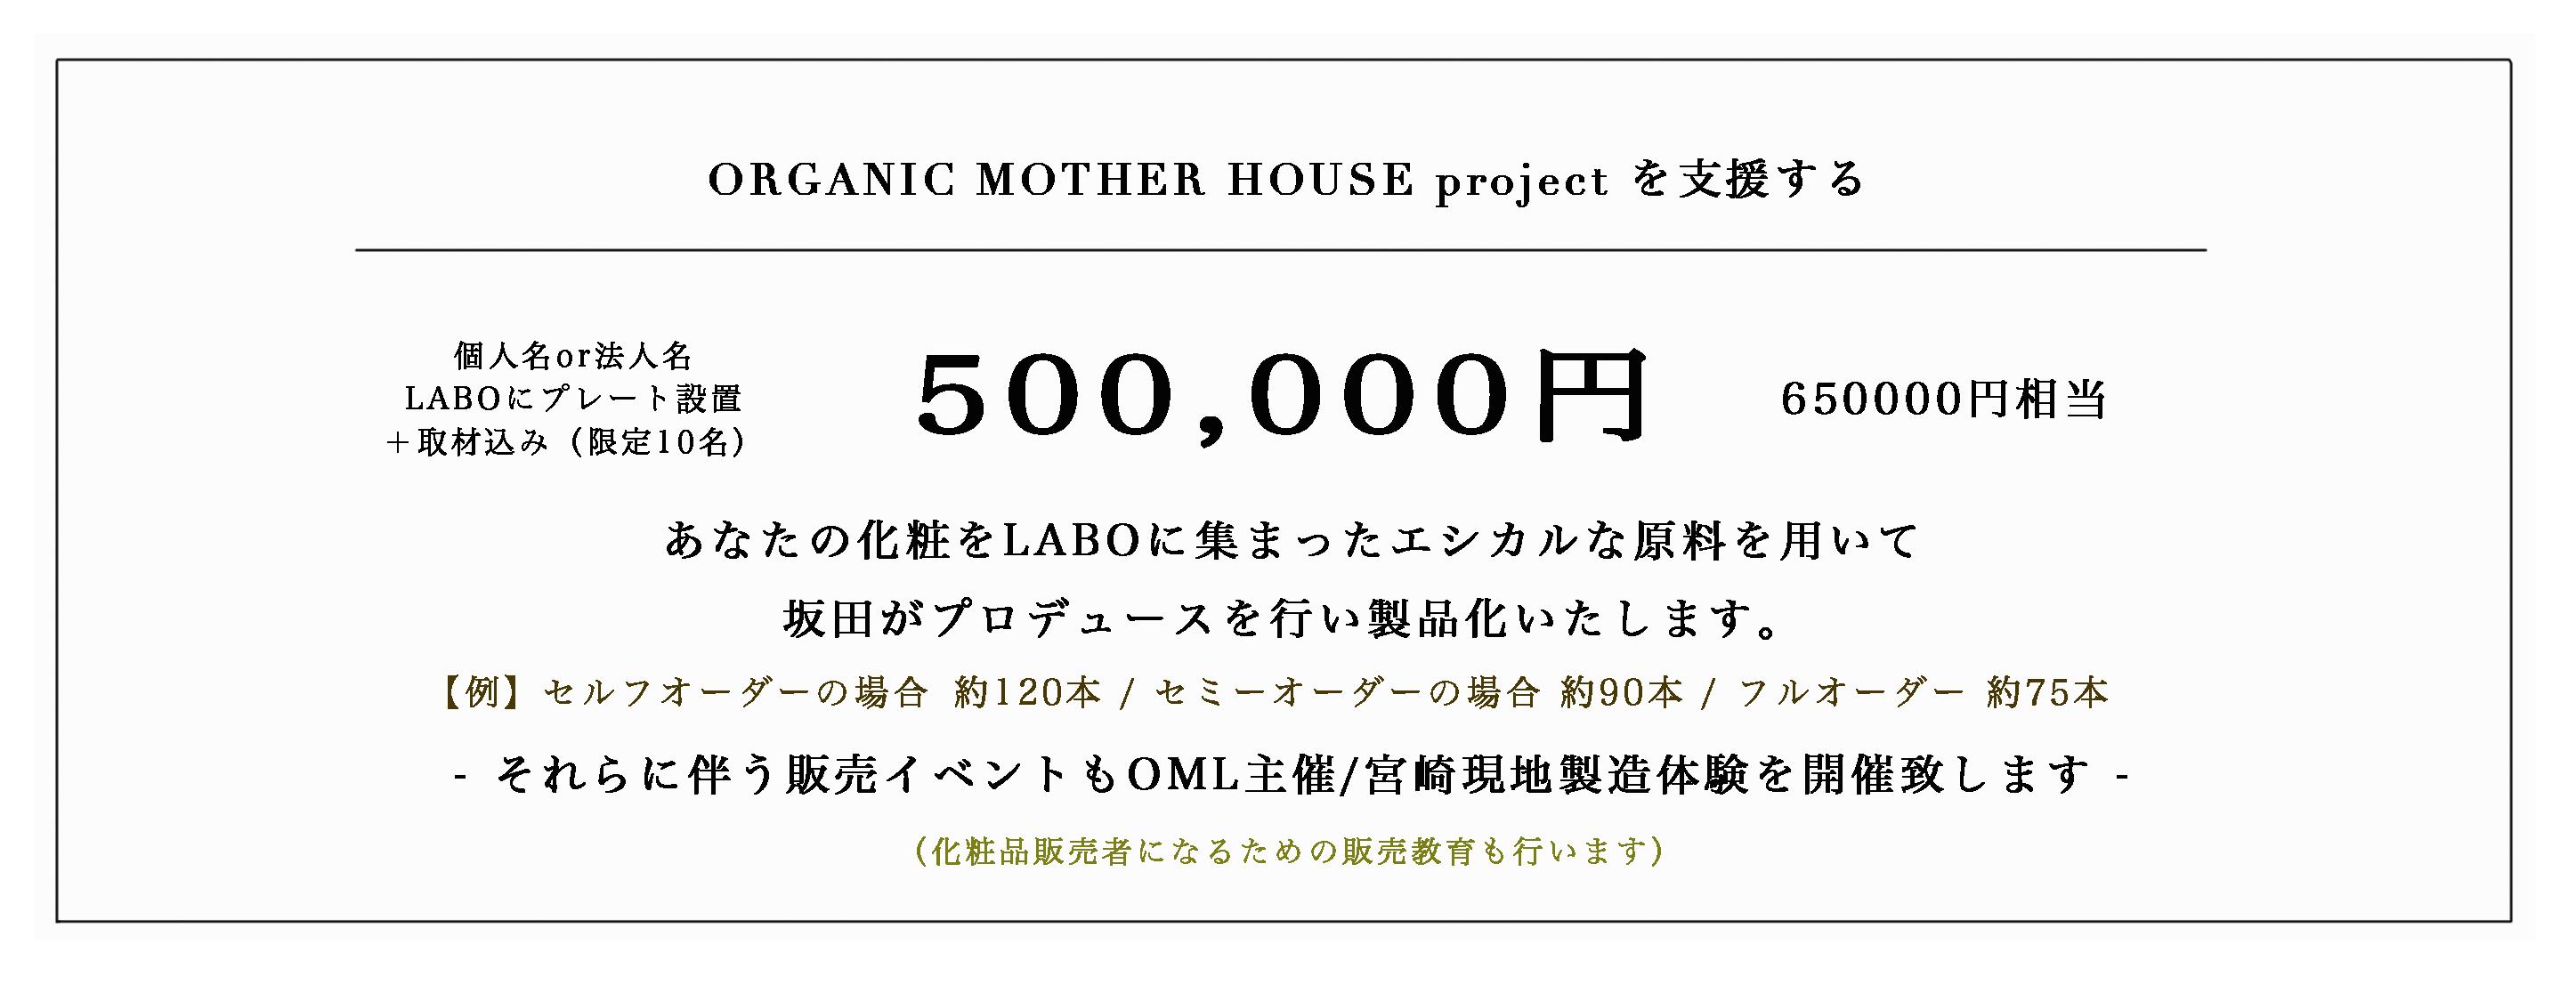 ORGANIC MOTHER HOUSE〈植物調合美容研究所〉50万